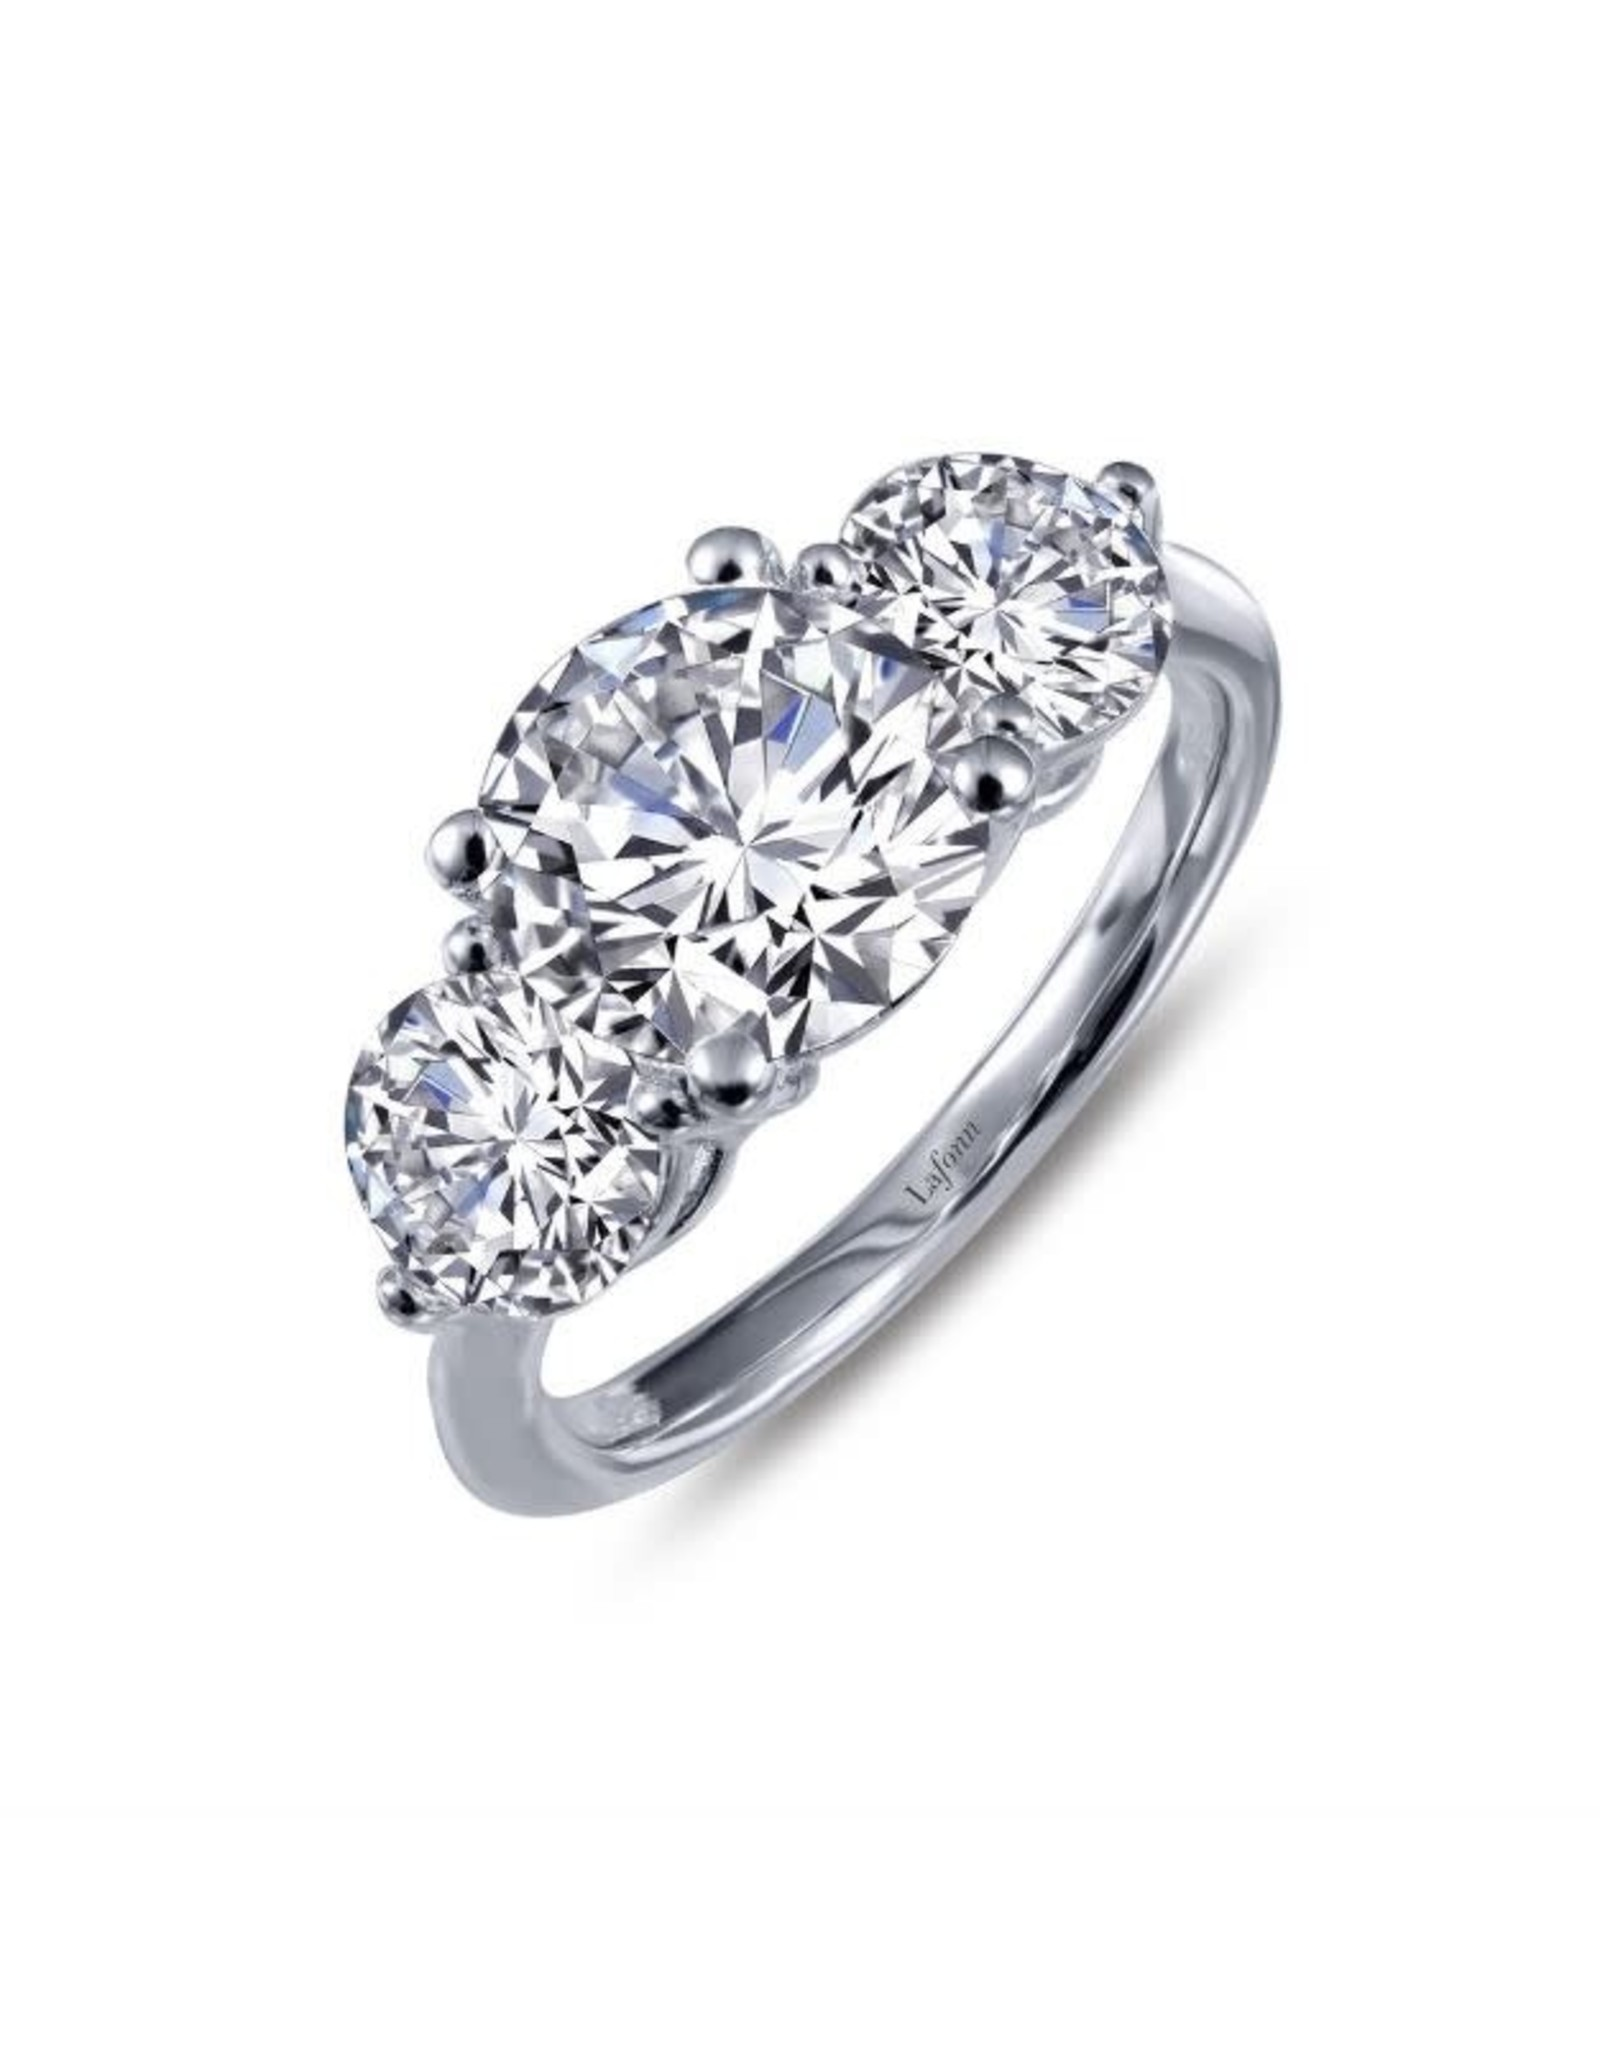 Silver Three Stone Zirconia Engagement Ring, CZ: 2.99ct